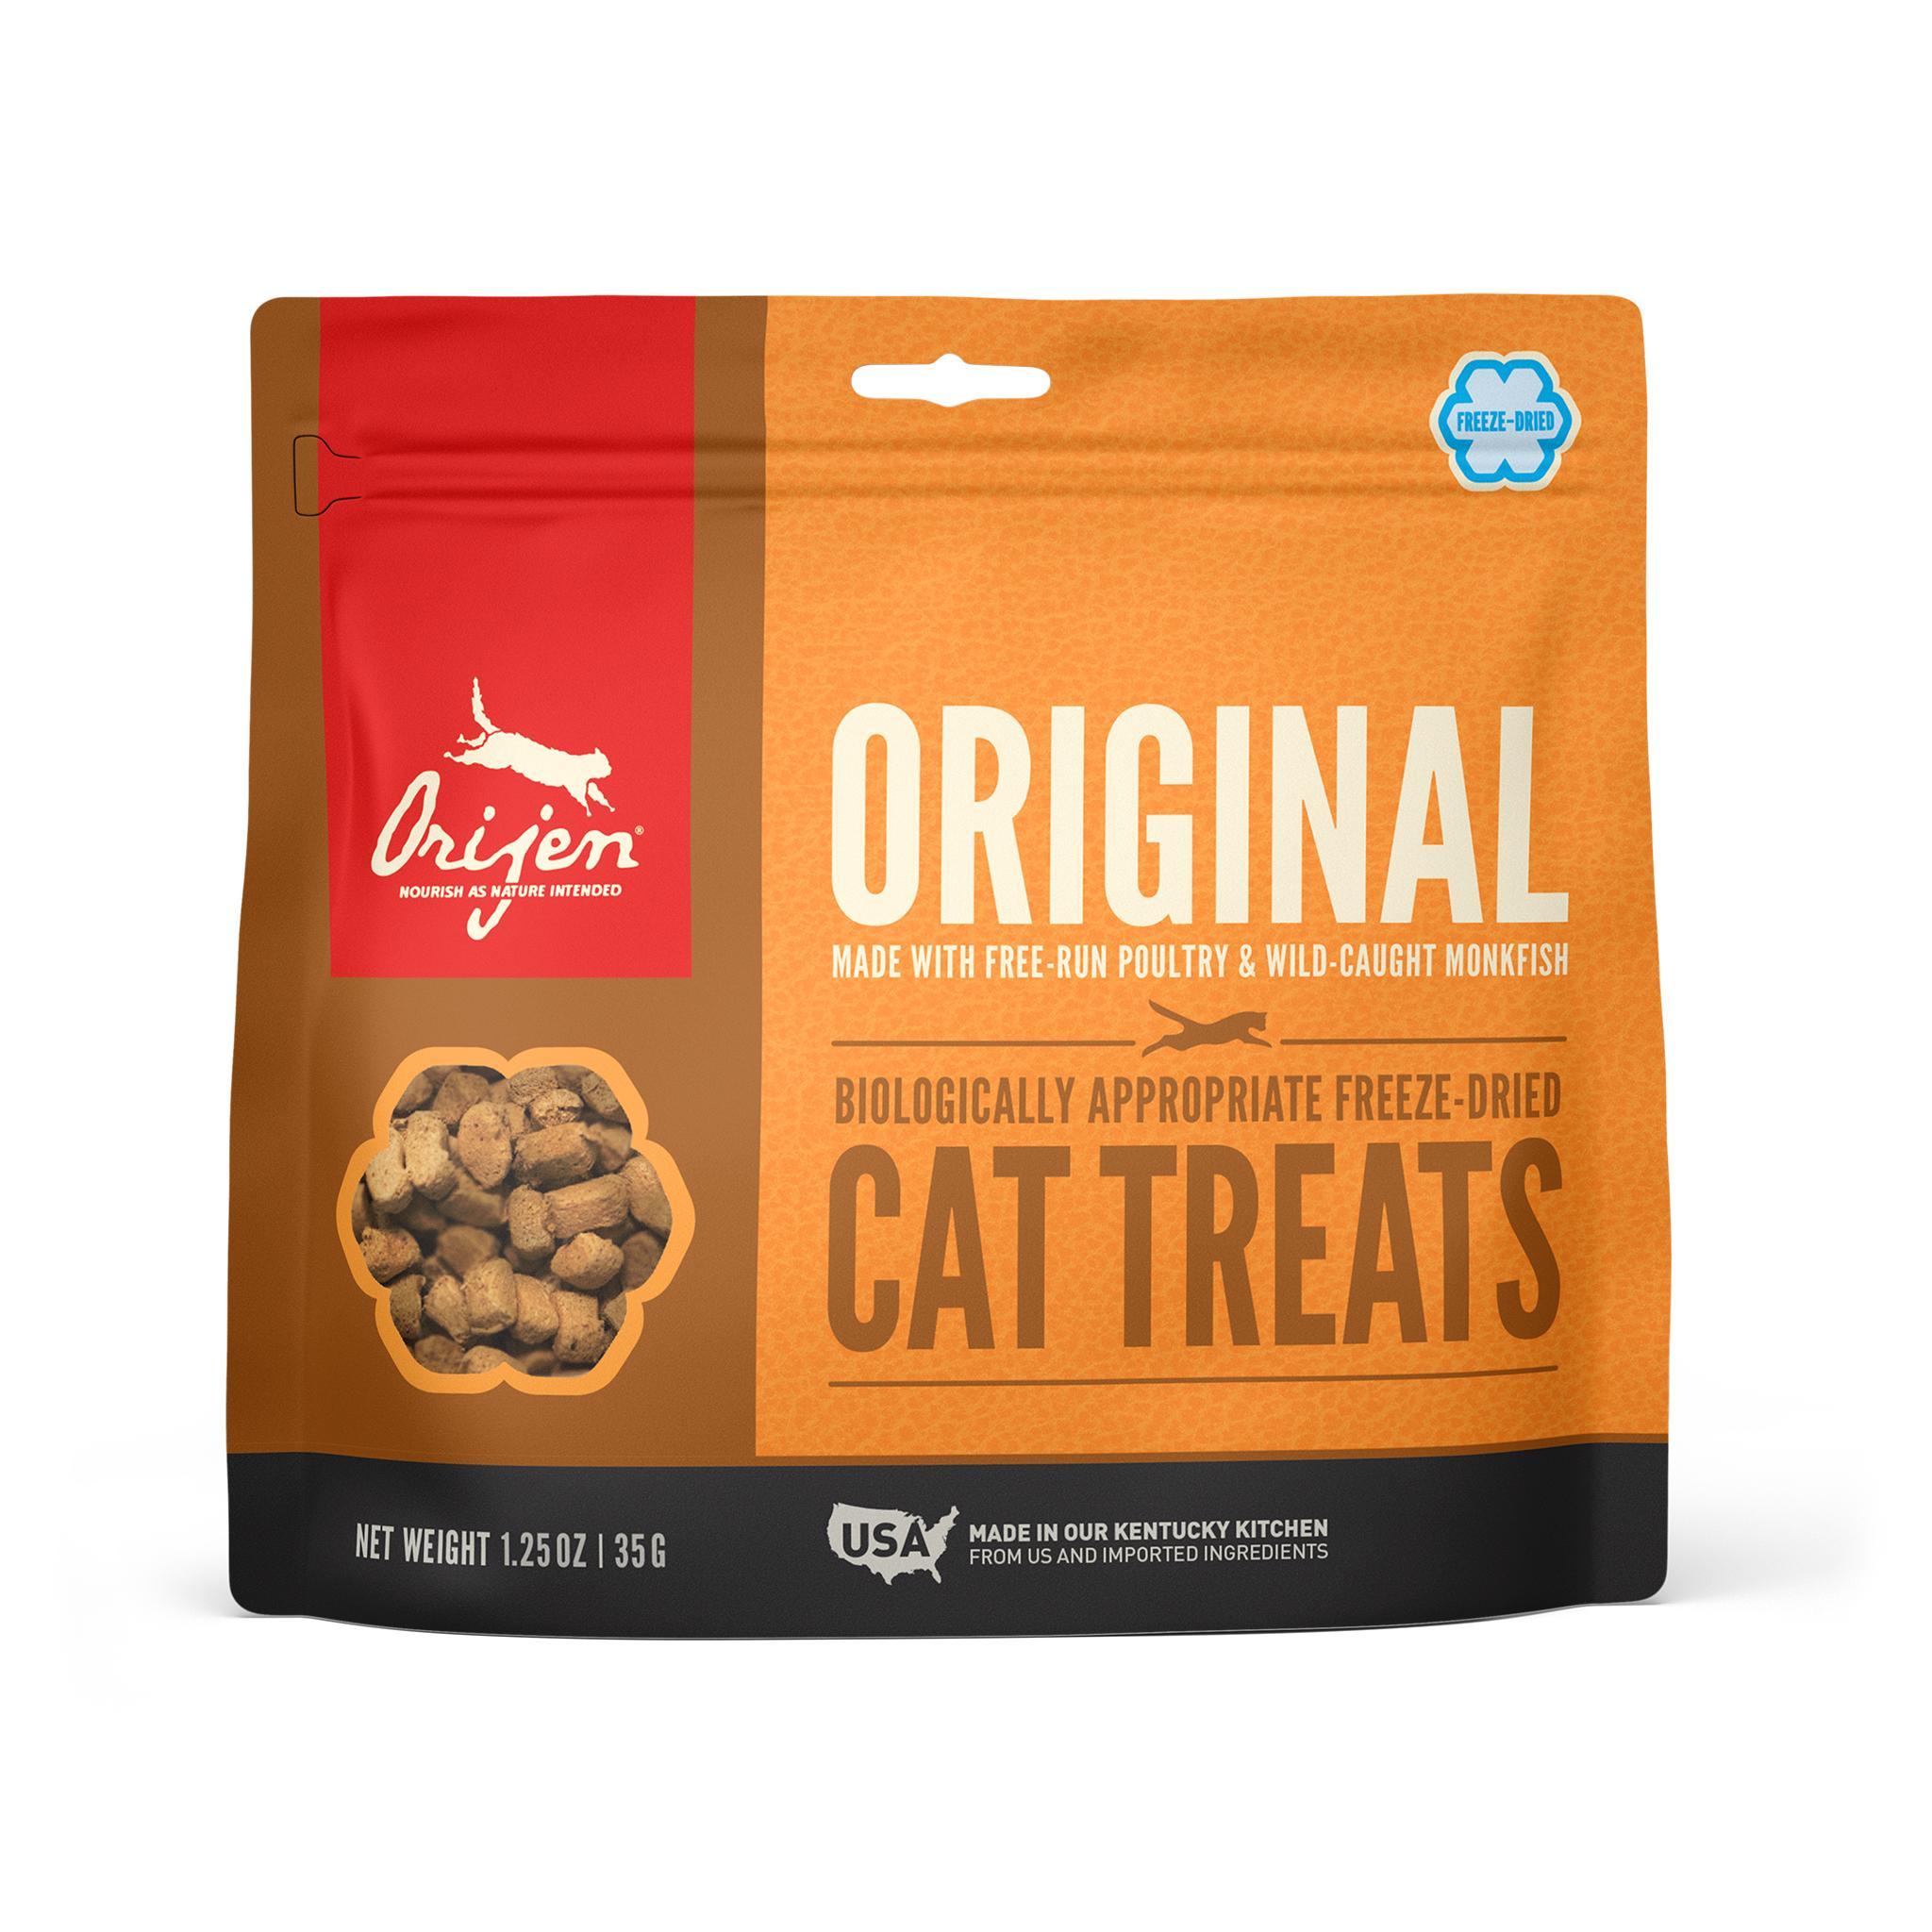 ORIJEN Original Grain-Free Freeze-Dried Cat Treats, 1.25-oz